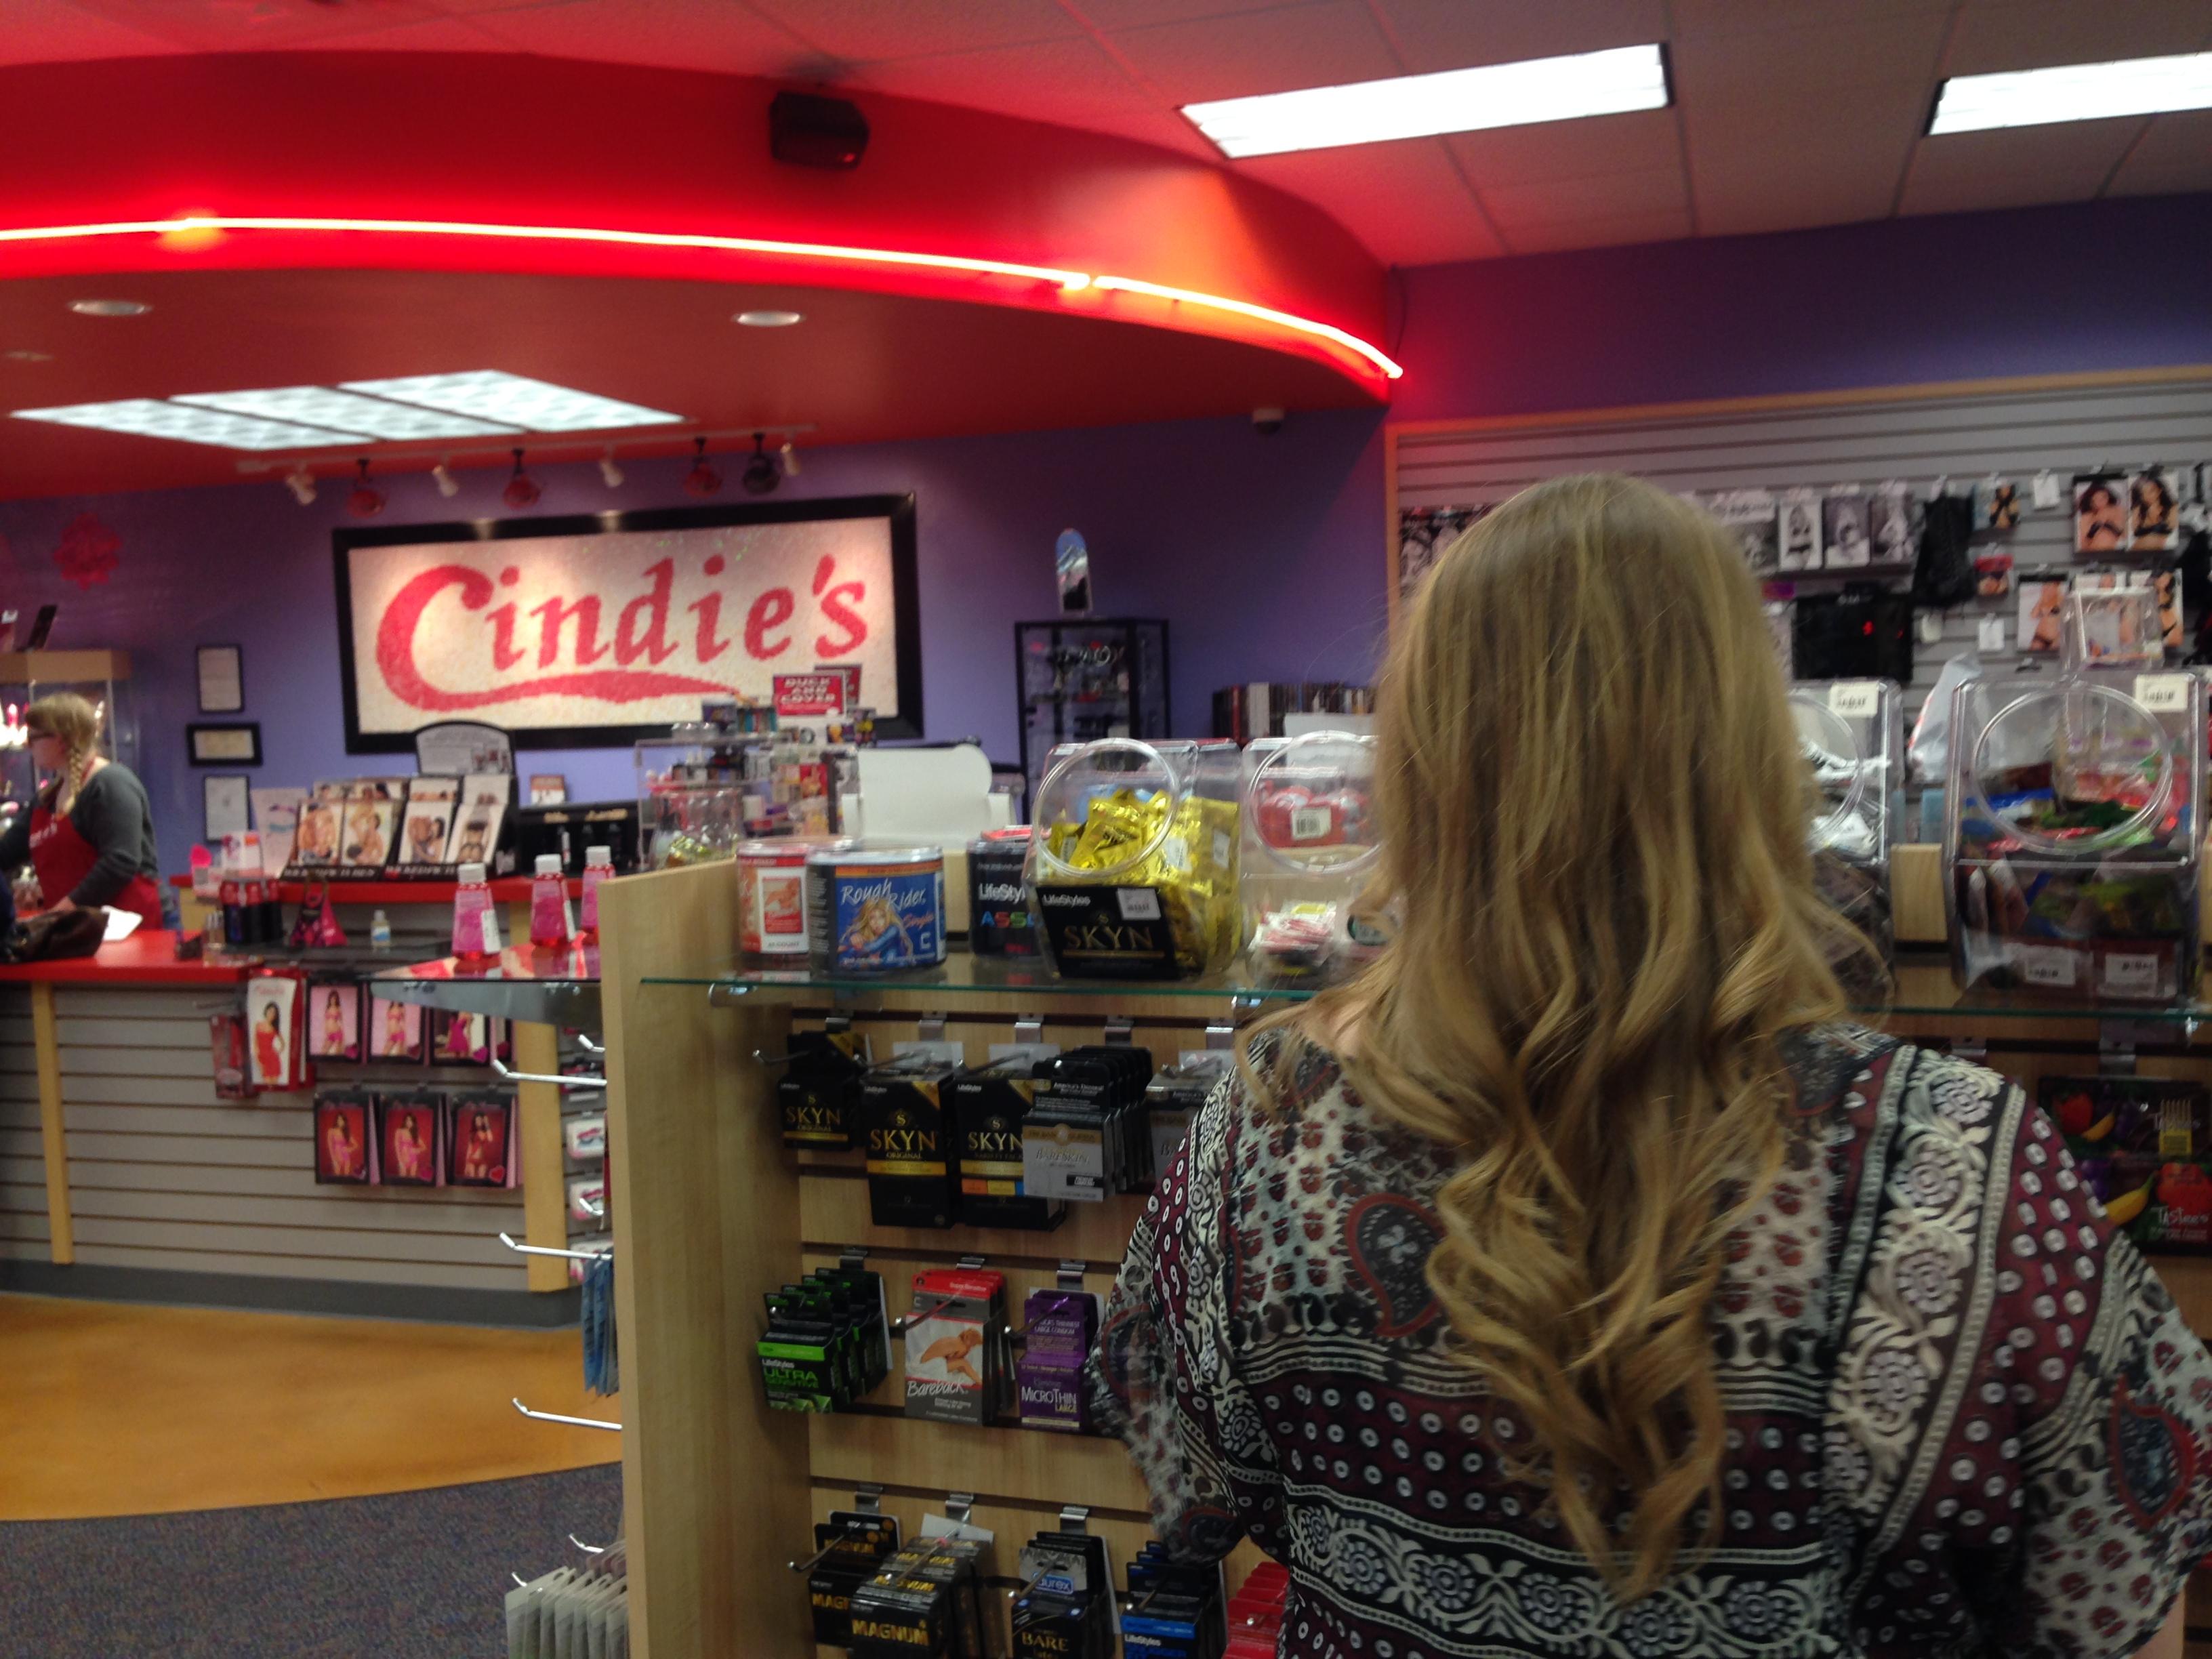 Cindies sex store in houston